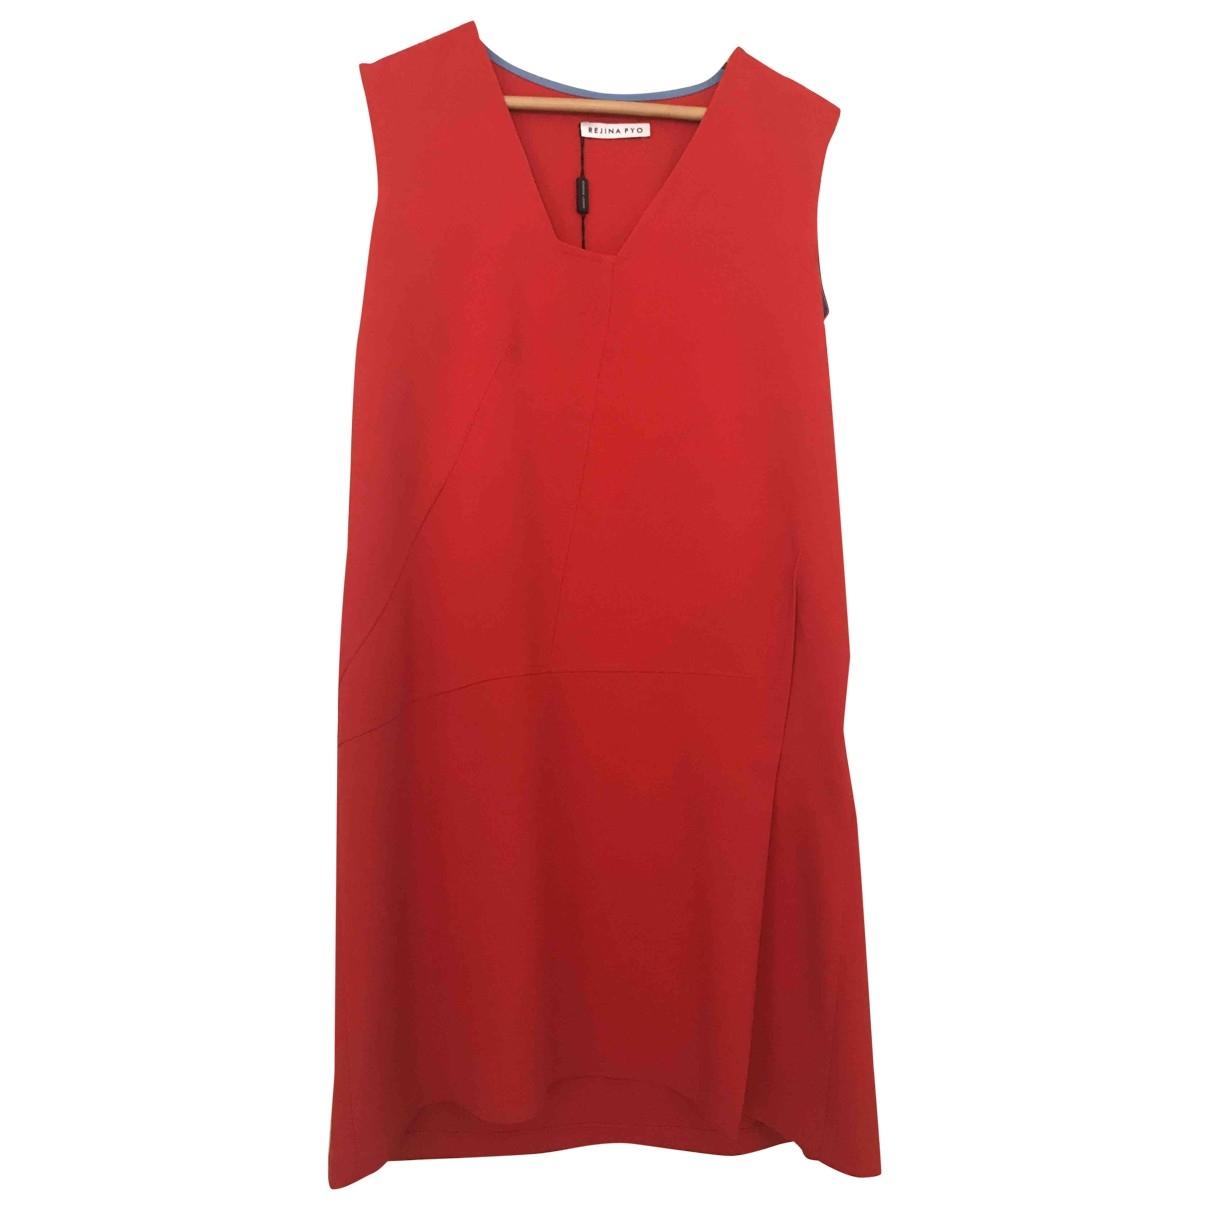 Rejina Pyo \N Red dress for Women 12 UK